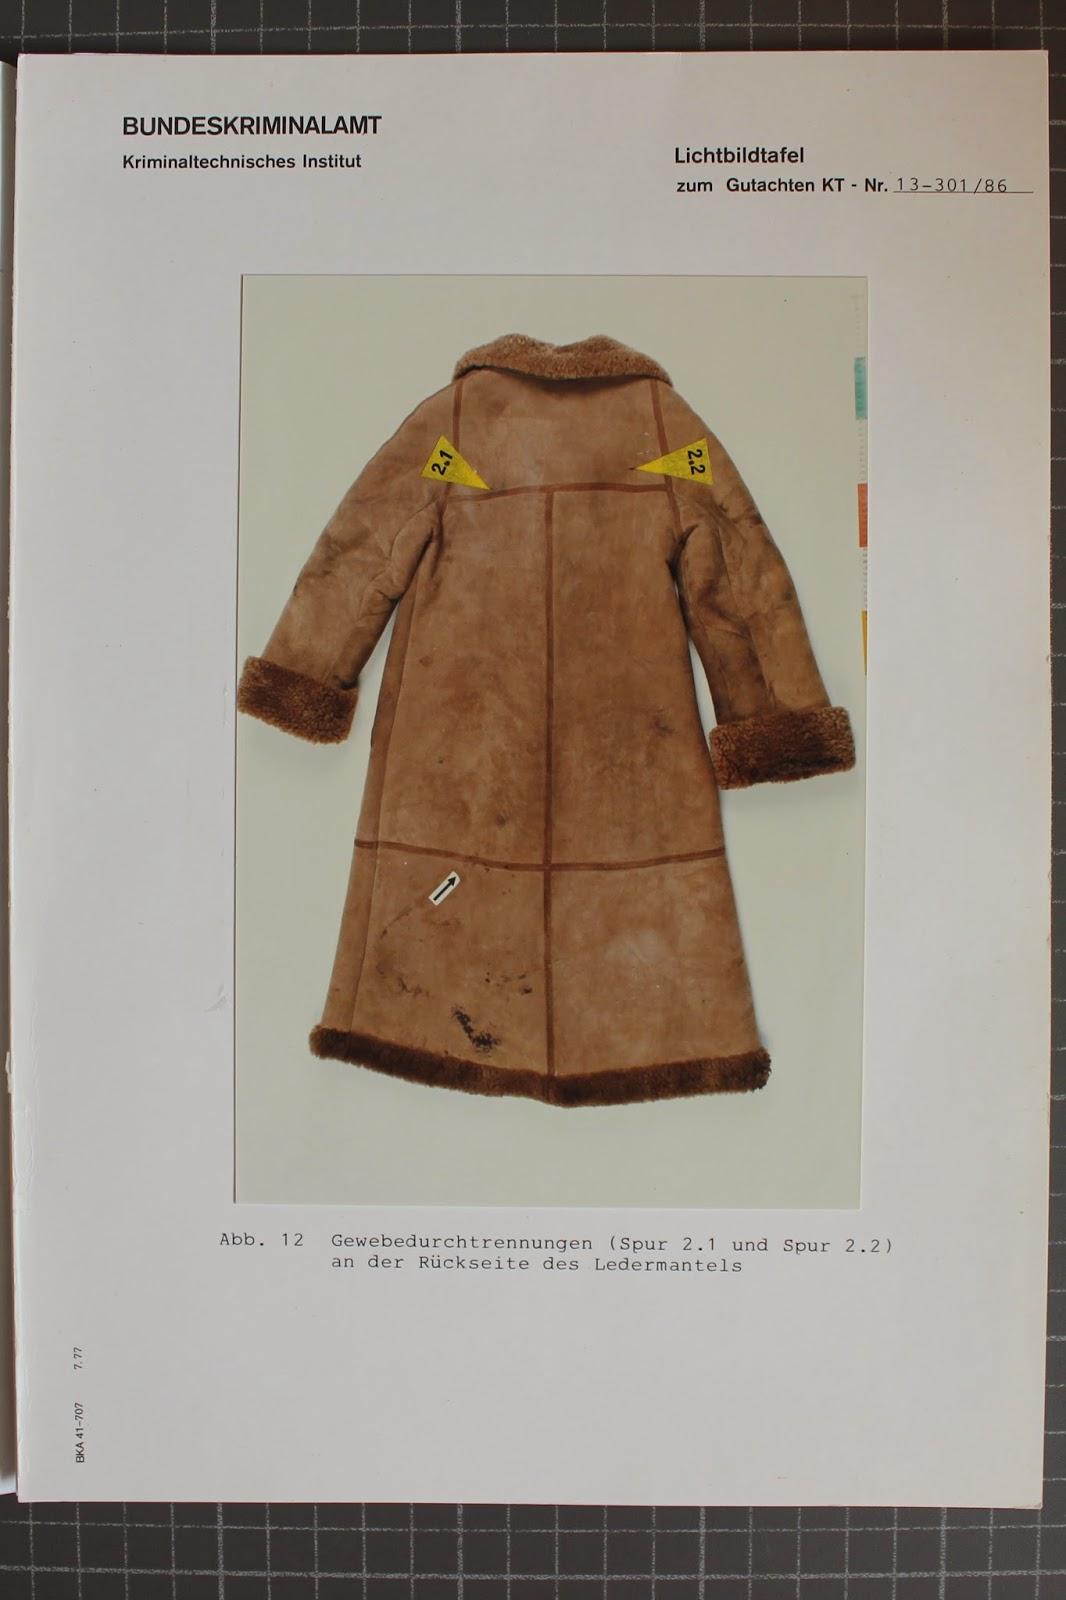 Lisbeth Palmes kläder 1